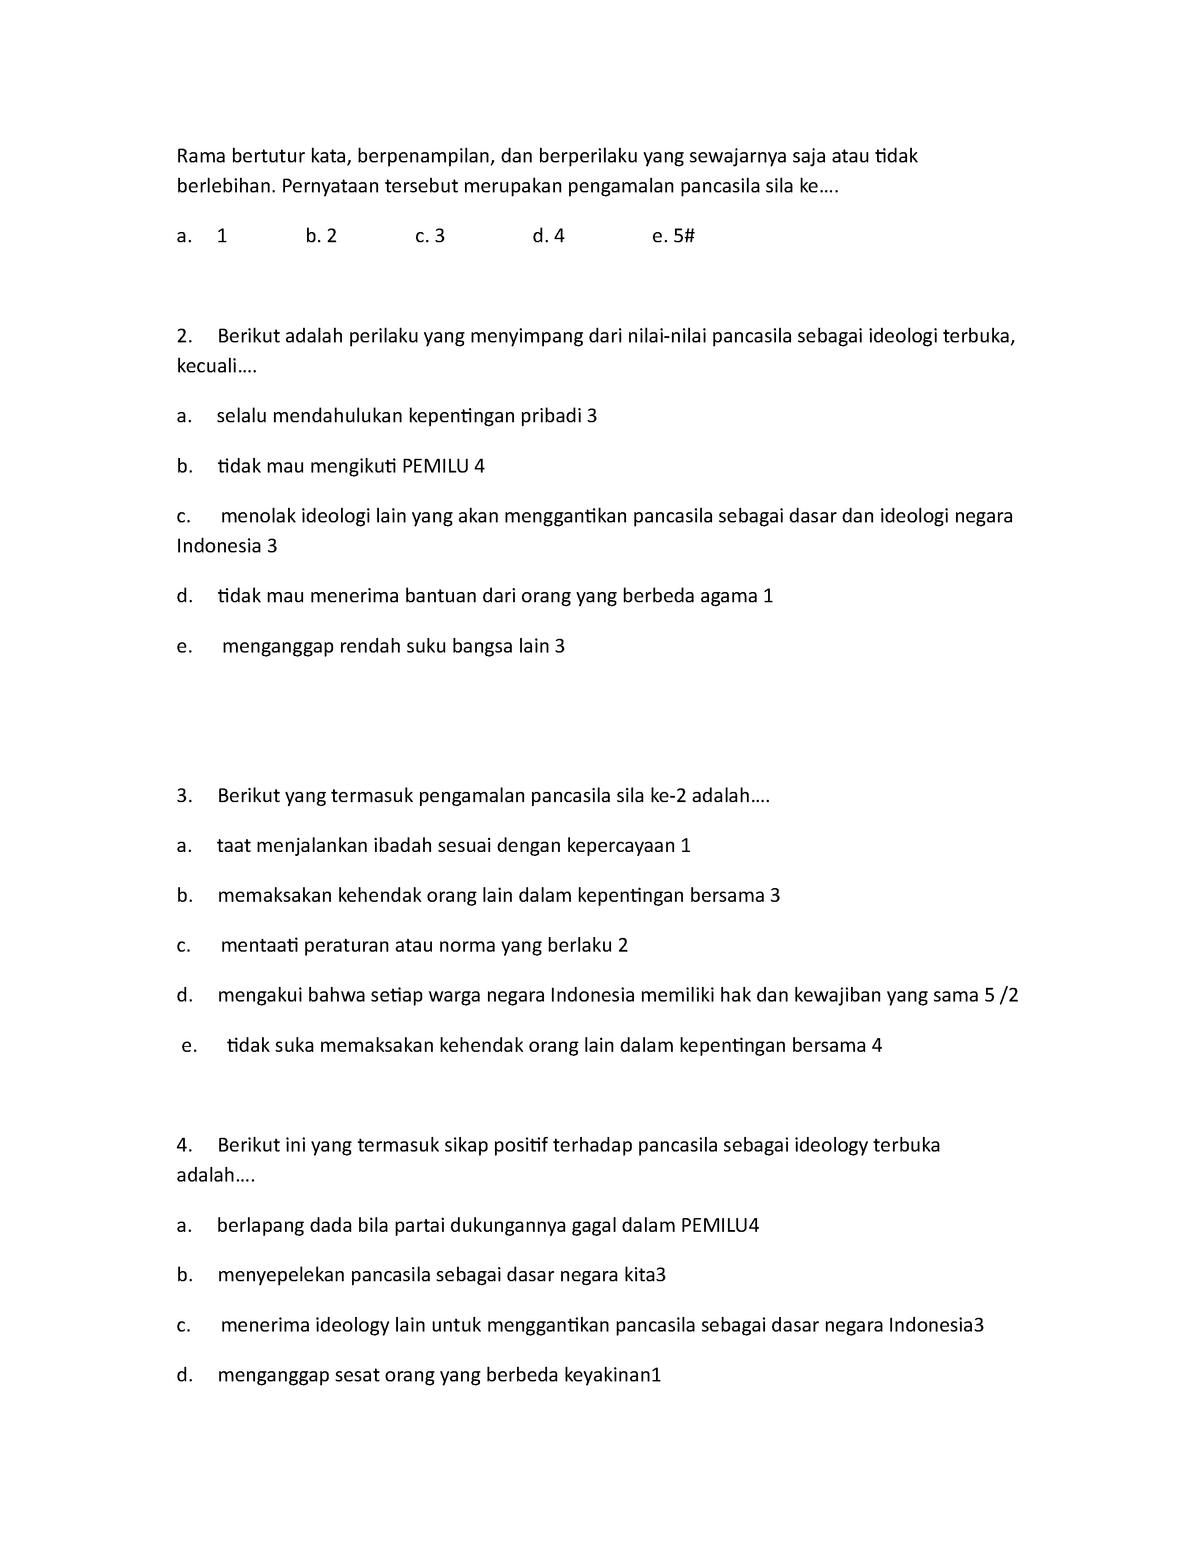 Contoh Soal Pengamalan Pancasila Mata Kuliah Pilihan 1 Studocu